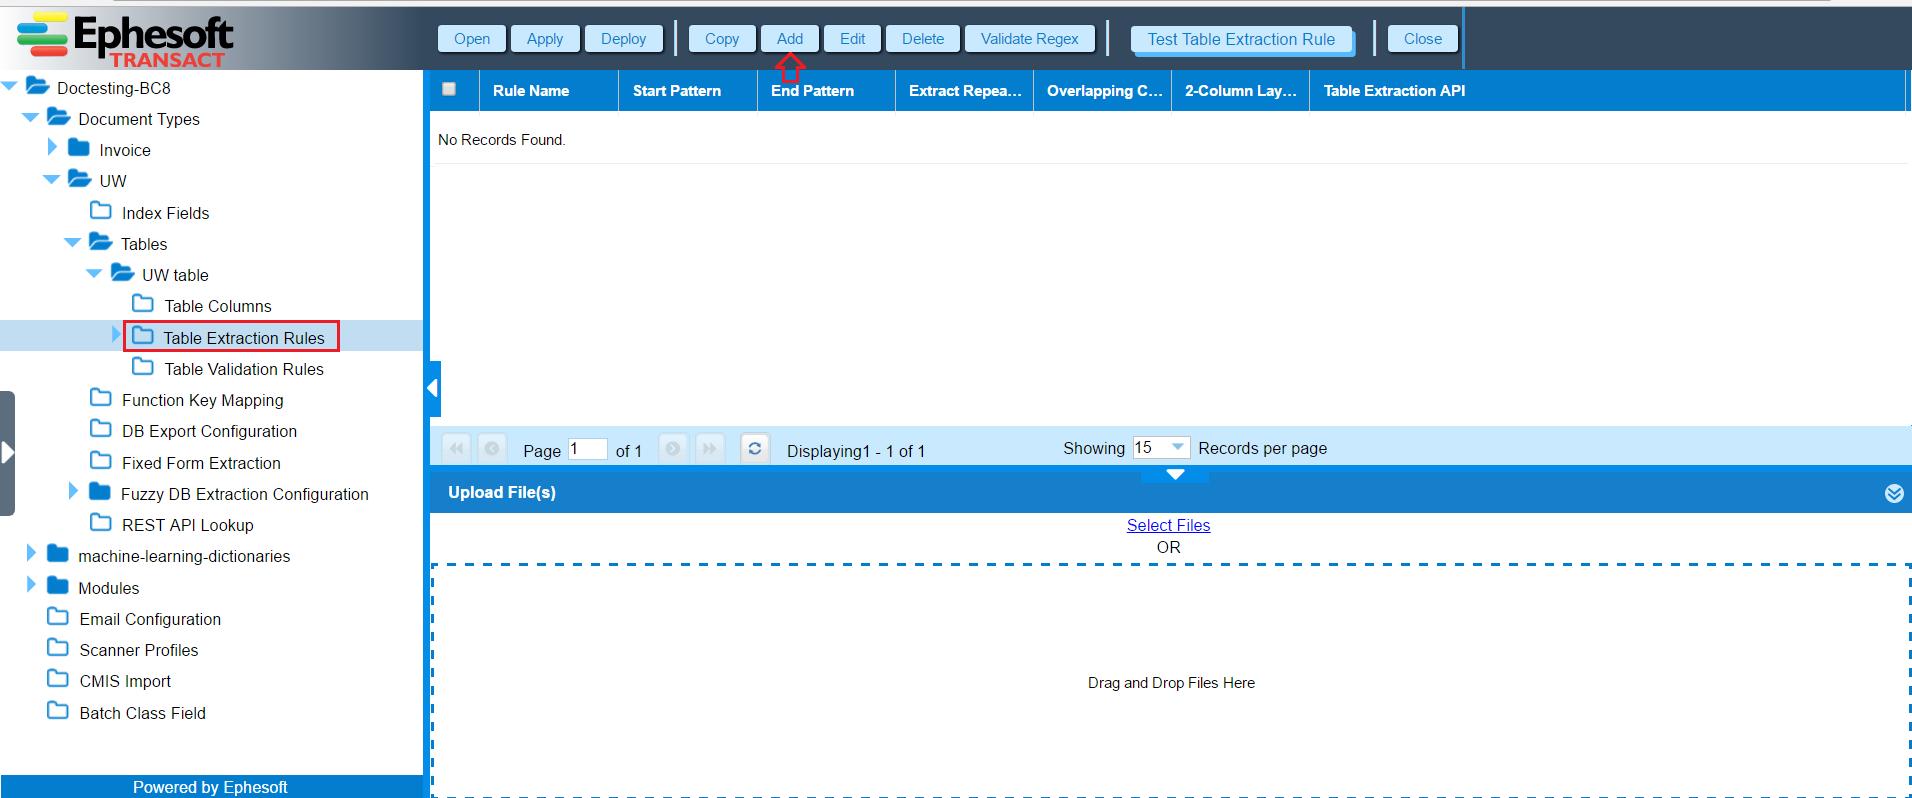 C:UsersEphesoftAppDataLocalMicrosoftWindowsINetCacheContent.Wordtableextr.png